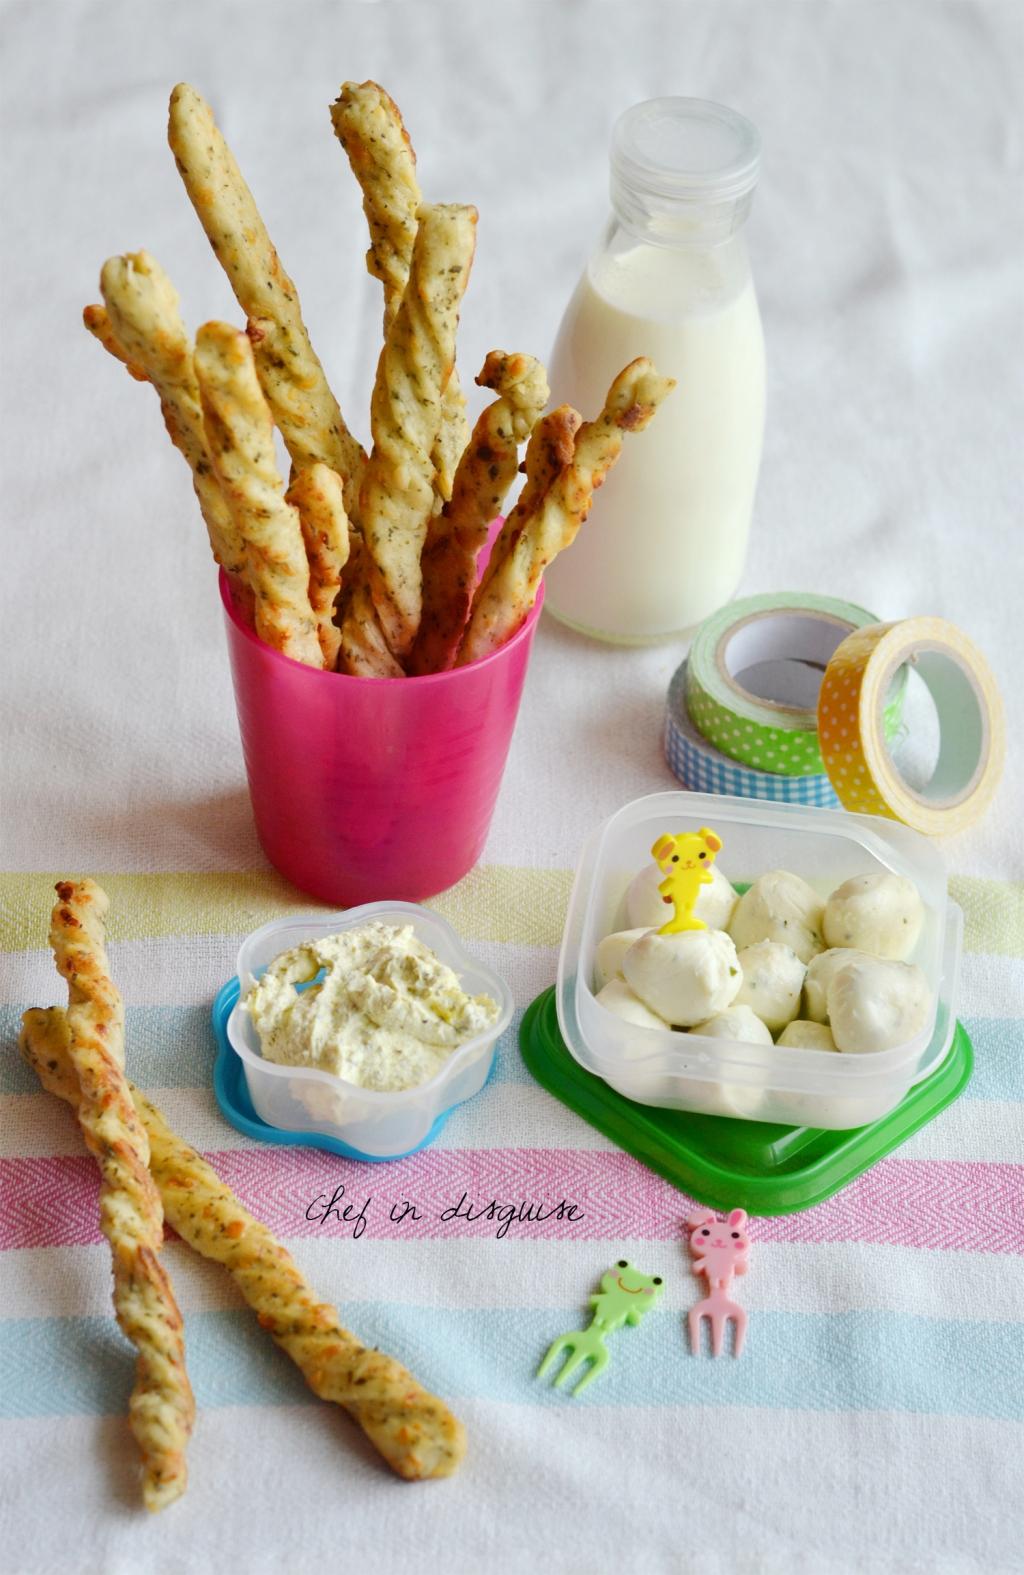 Cheese and zaatar sticks